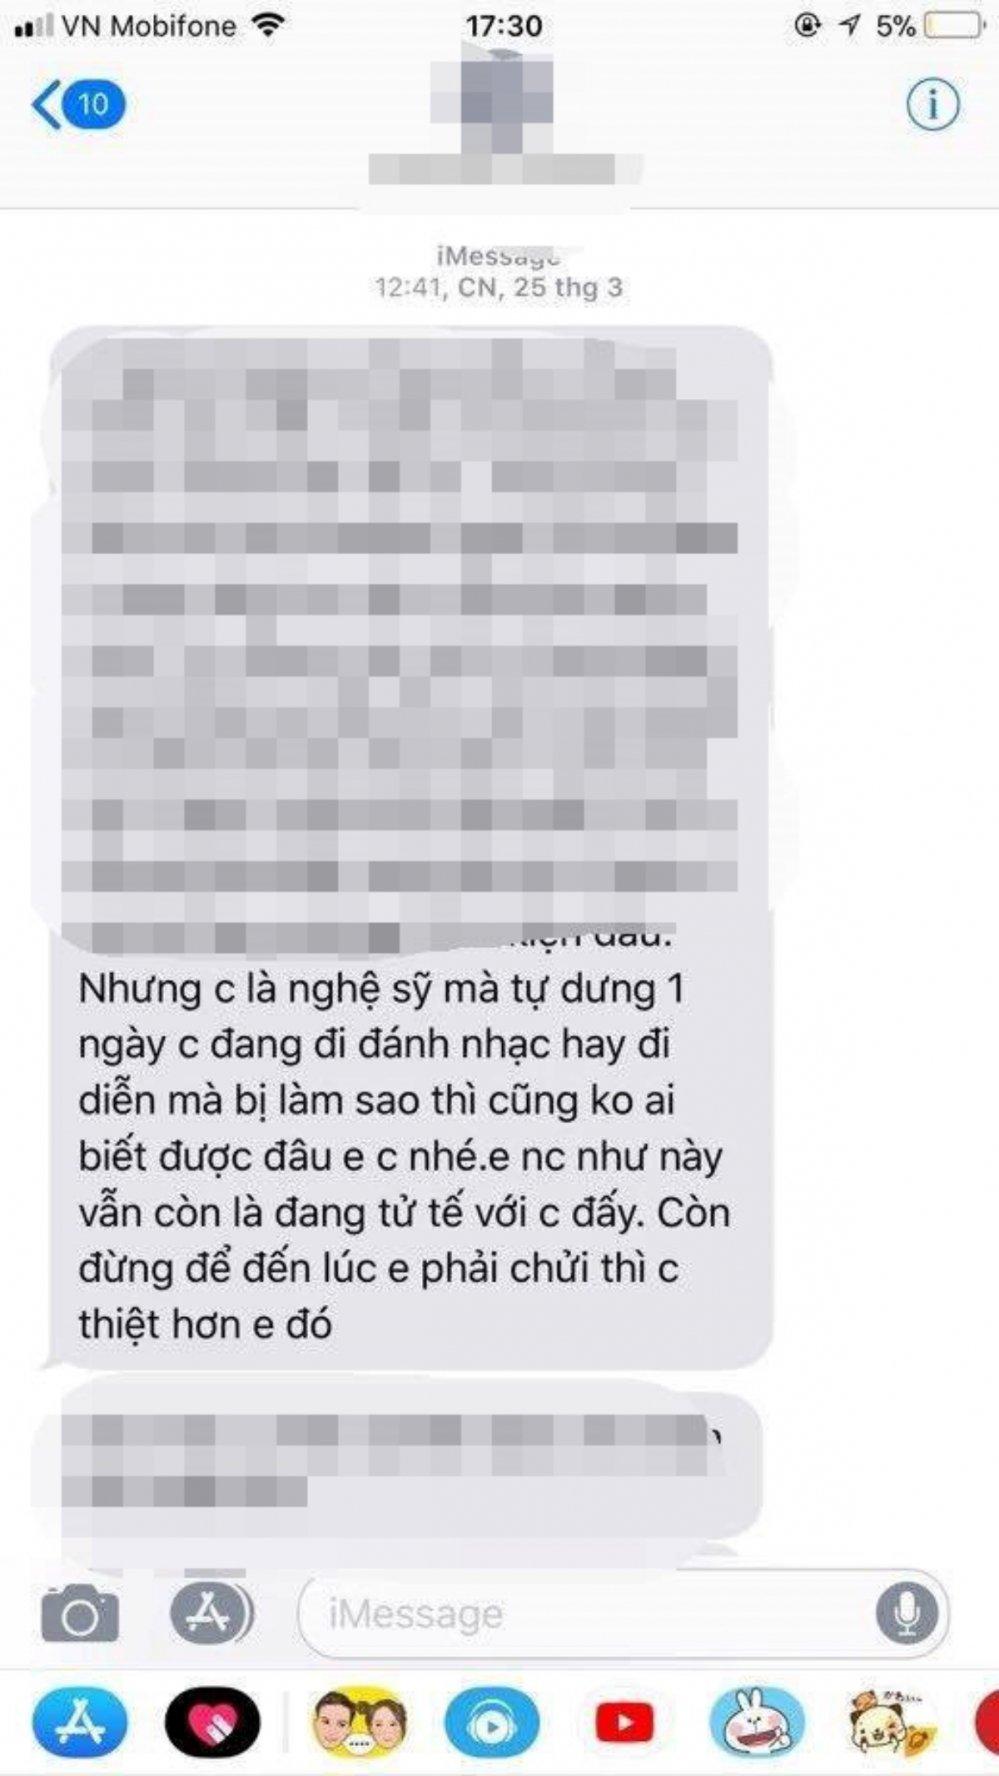 Vo Hoang Yen: 'Toi luu tin nhan va ghi am cuoc goi ham doa' hinh anh 2